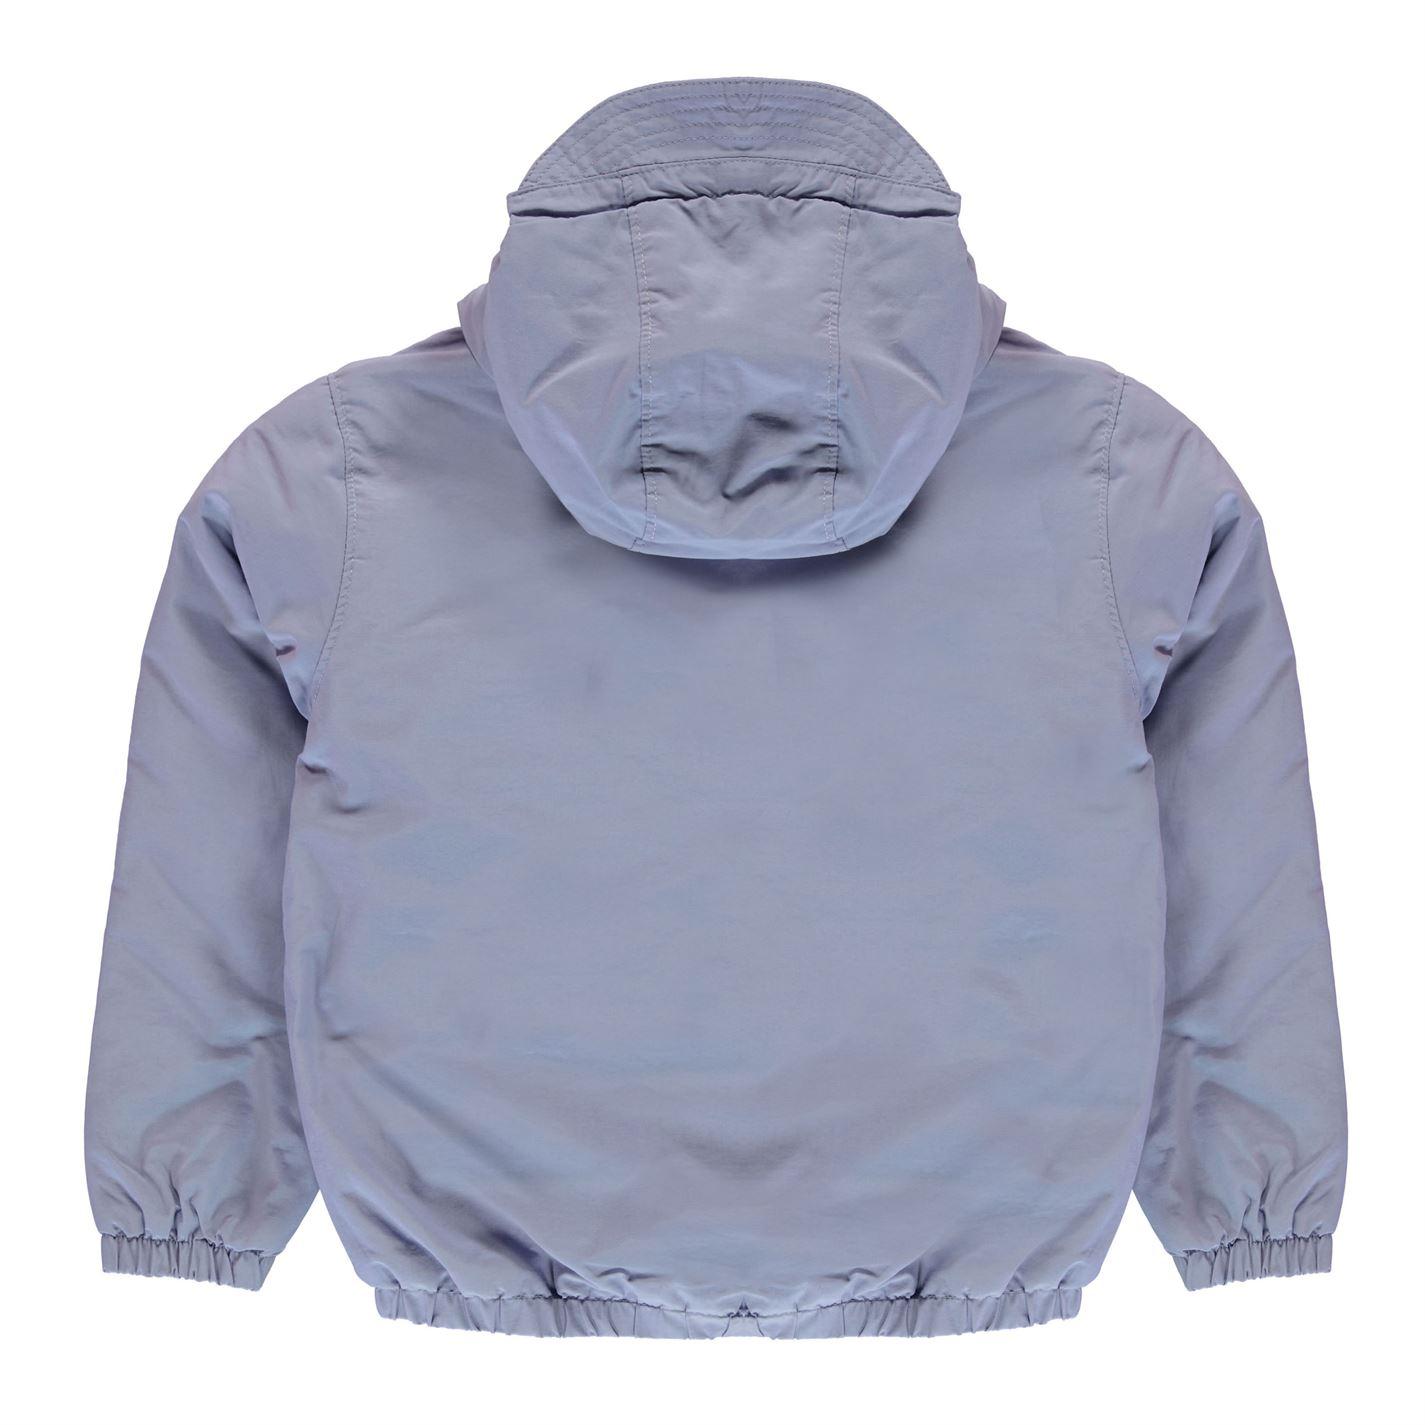 Lyle and Scott Kids Boys Zip Hd Jkt Juniors Nylon Jacket Coat Top